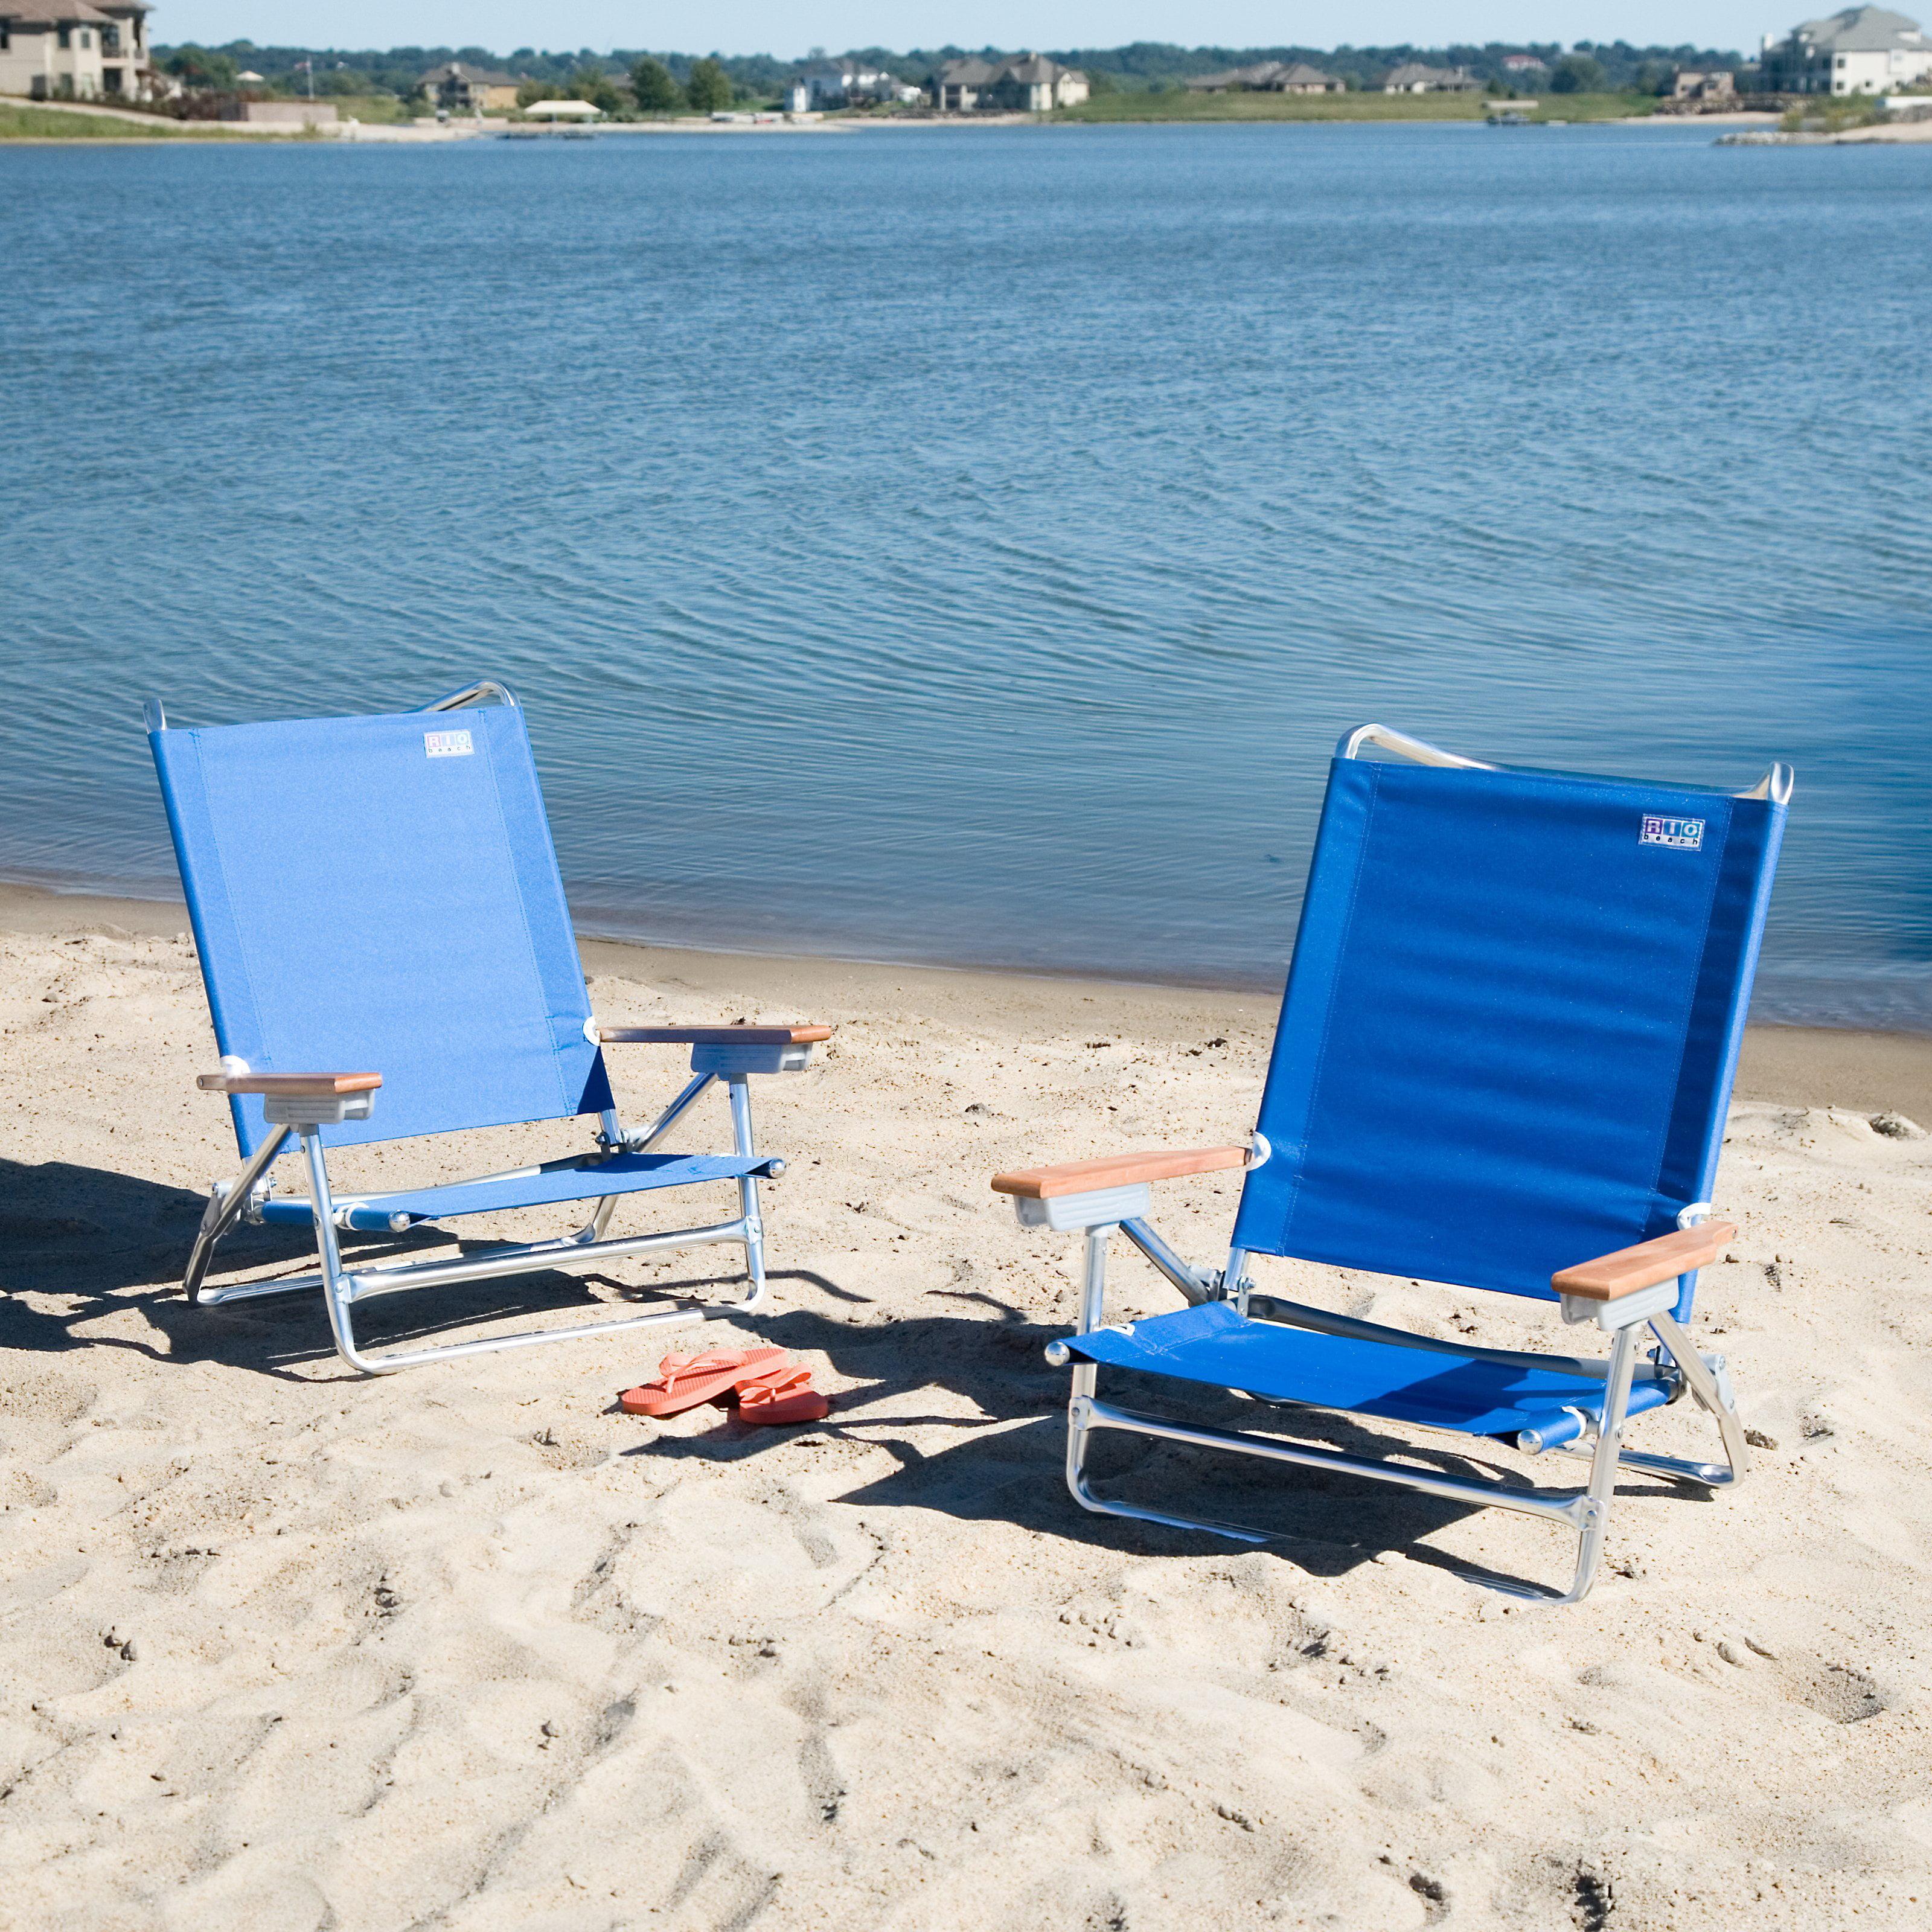 Rio Blue Deluxe Beach Chair Set of 2 Walmart